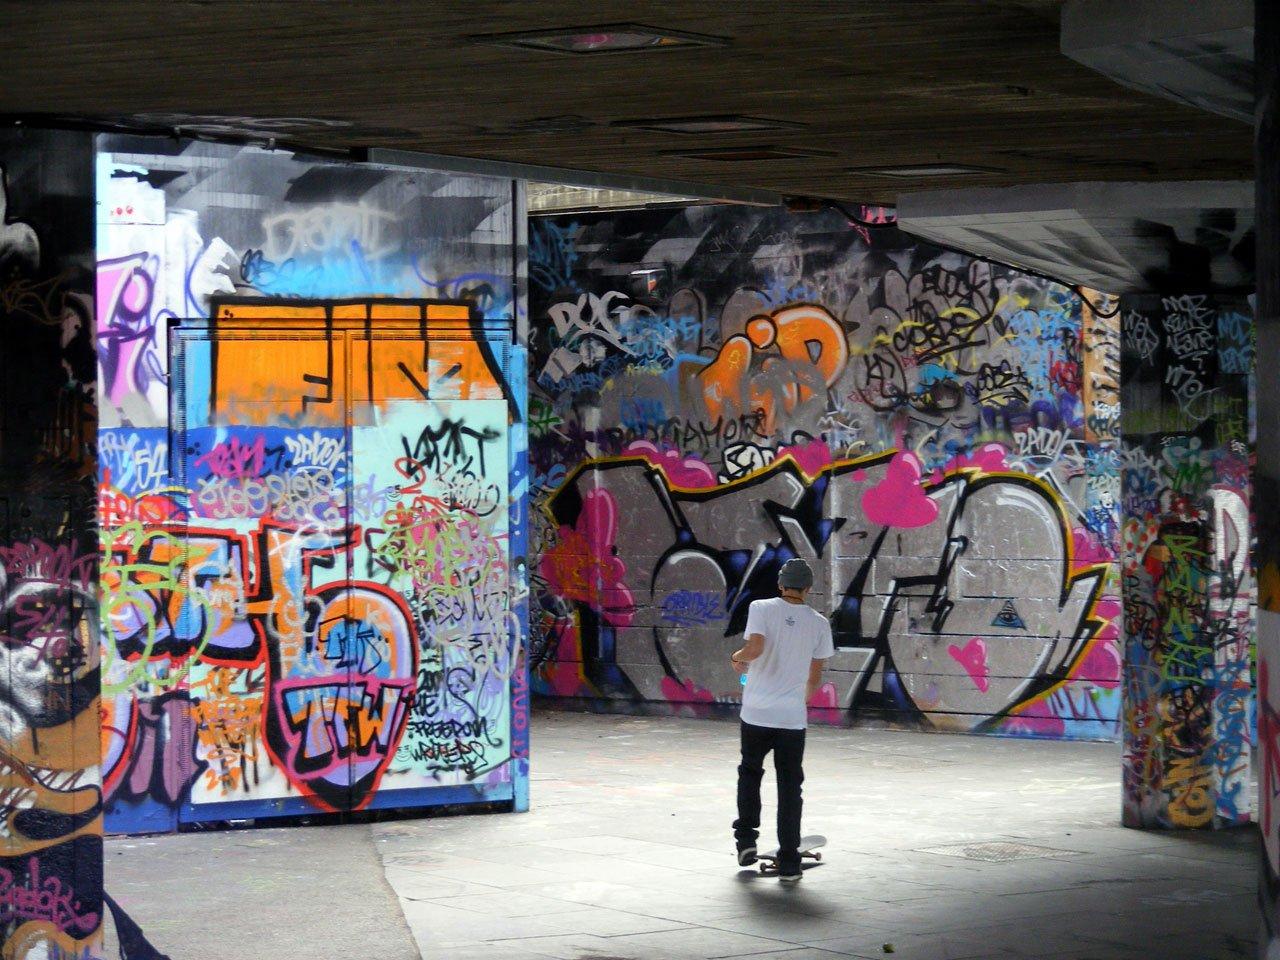 Gratis billeder kreativ vej gade by v g for Immagini graffiti hd